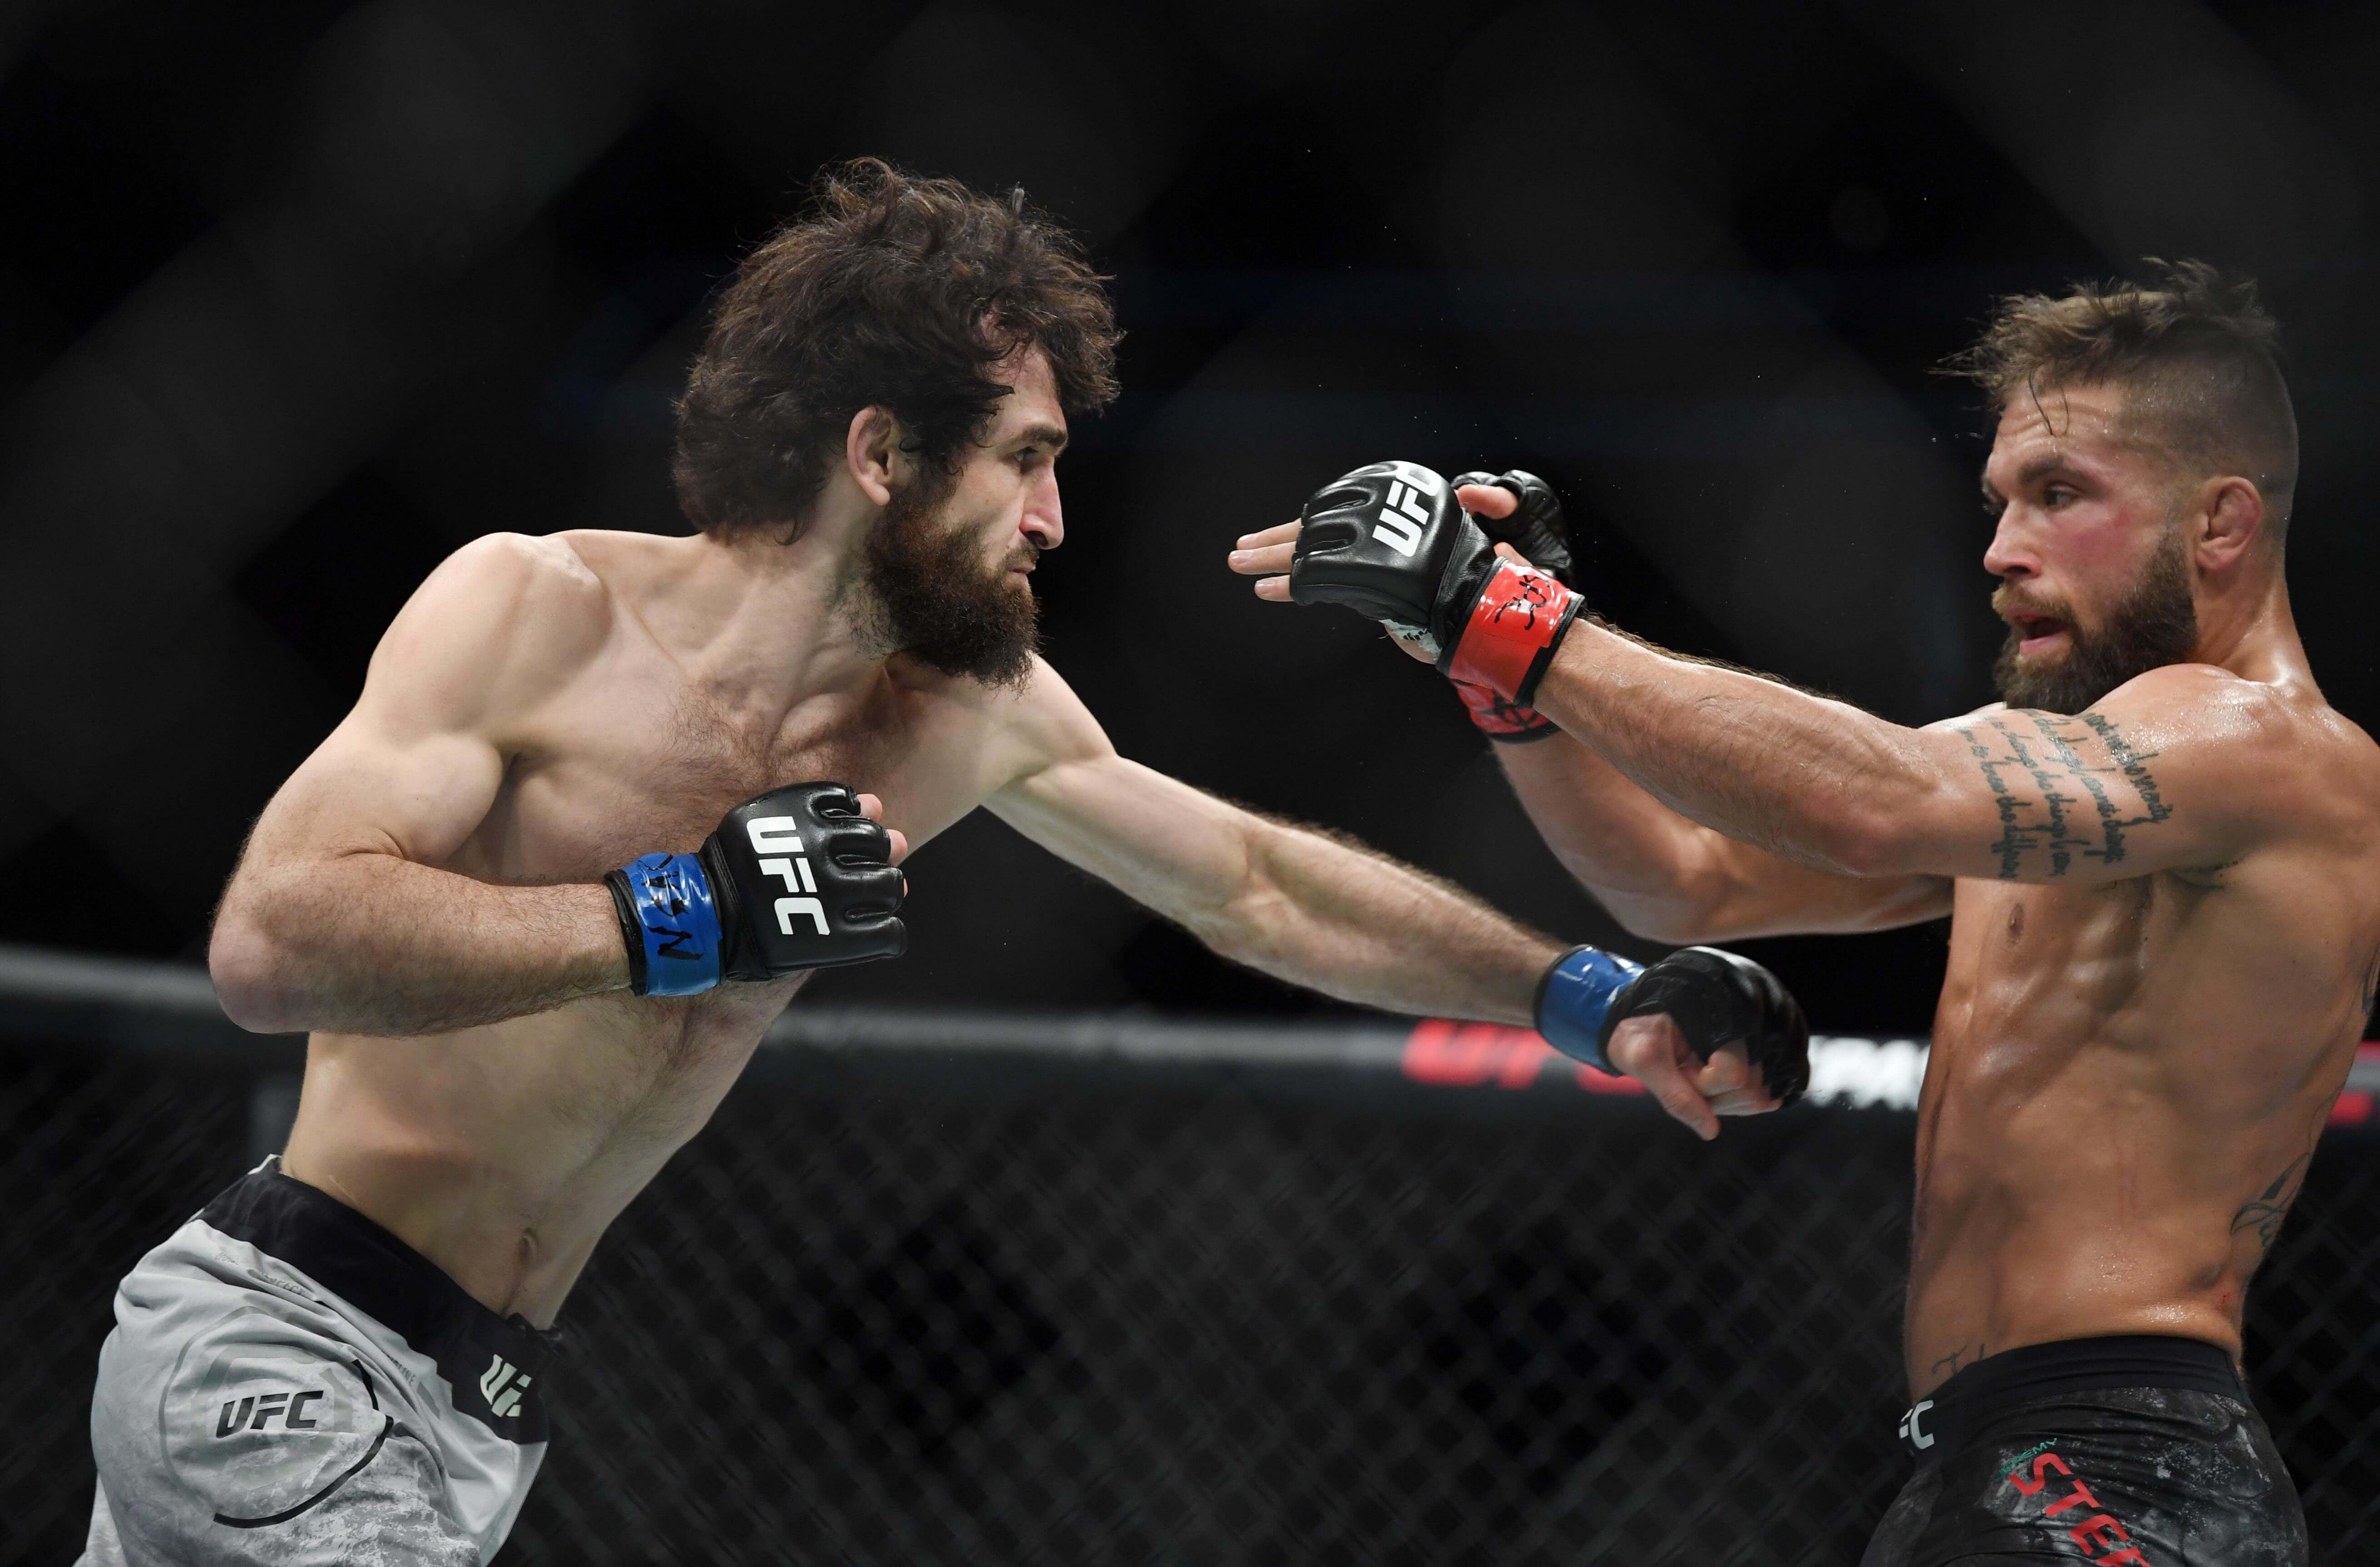 Zabit Magomedsharipov, UFC